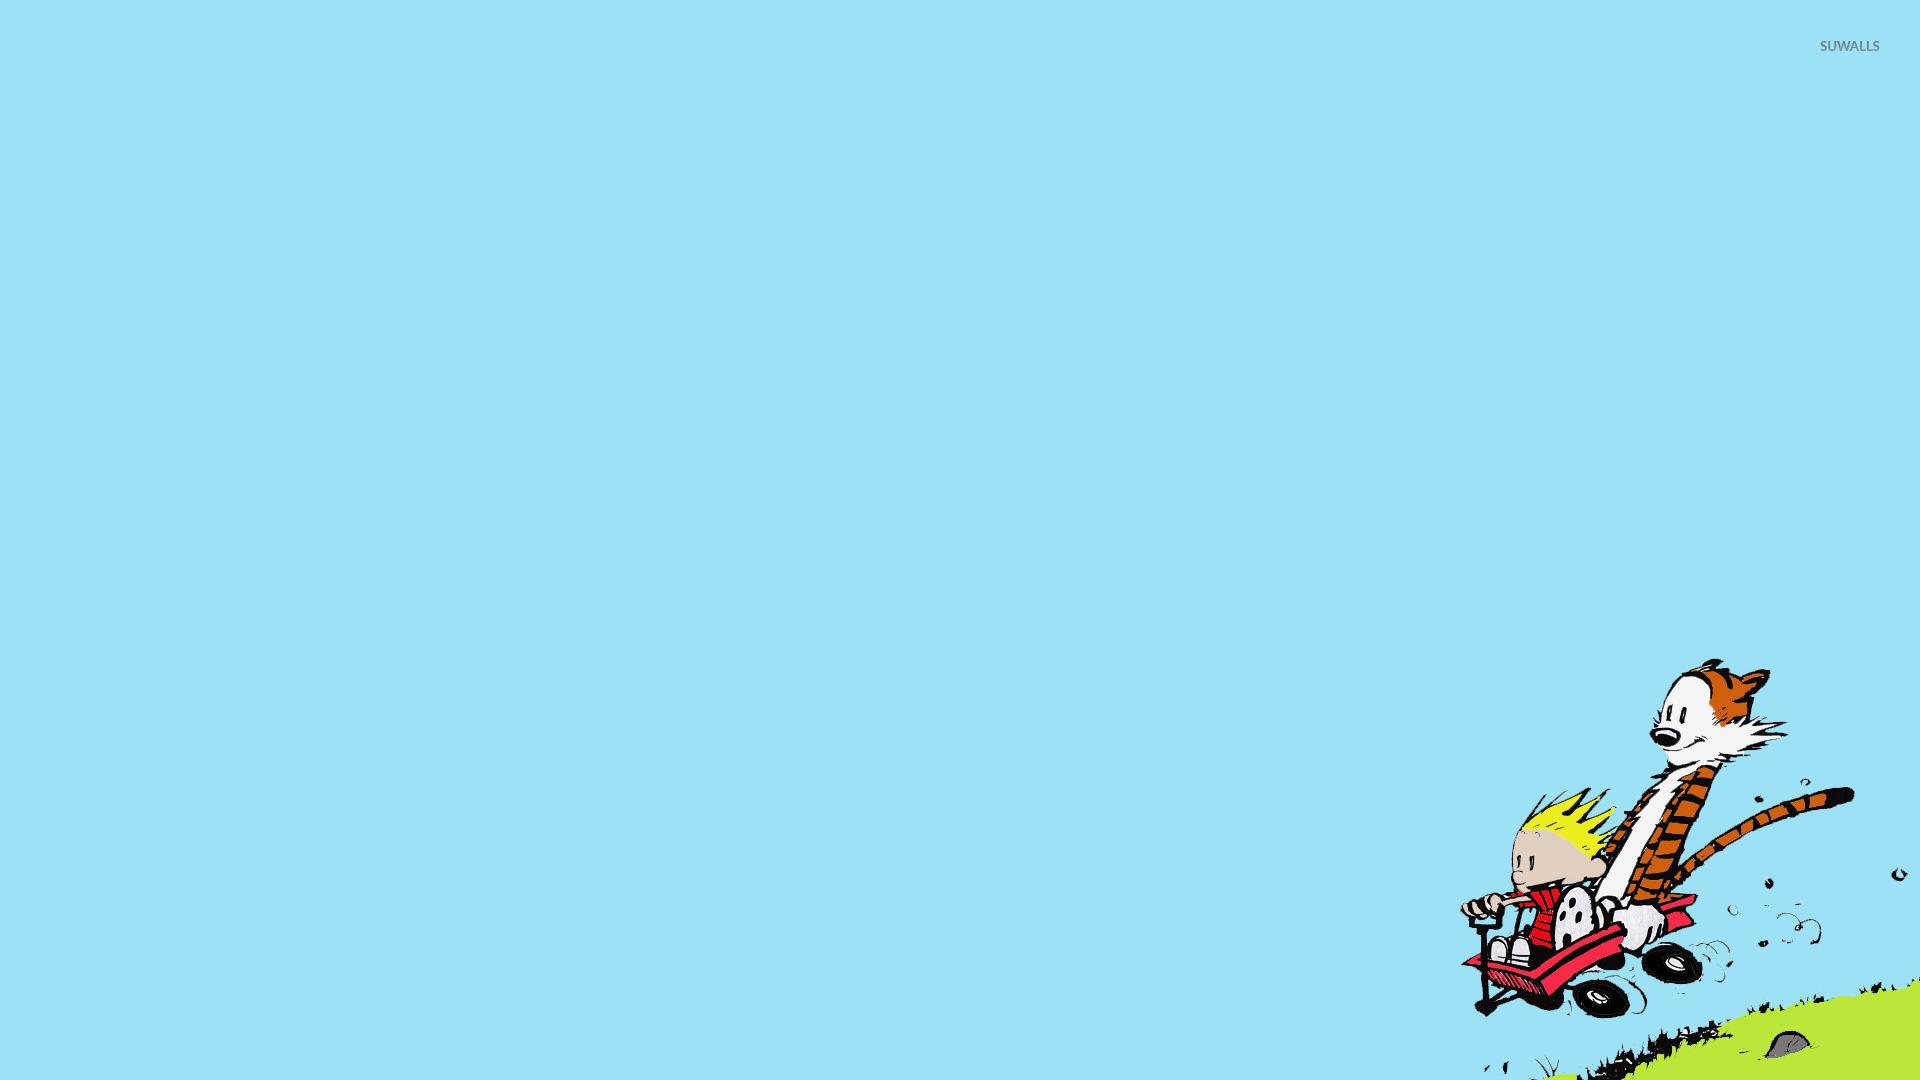 Free Download Calvin And Hobbes Wallpaper Cartoon Wallpapers